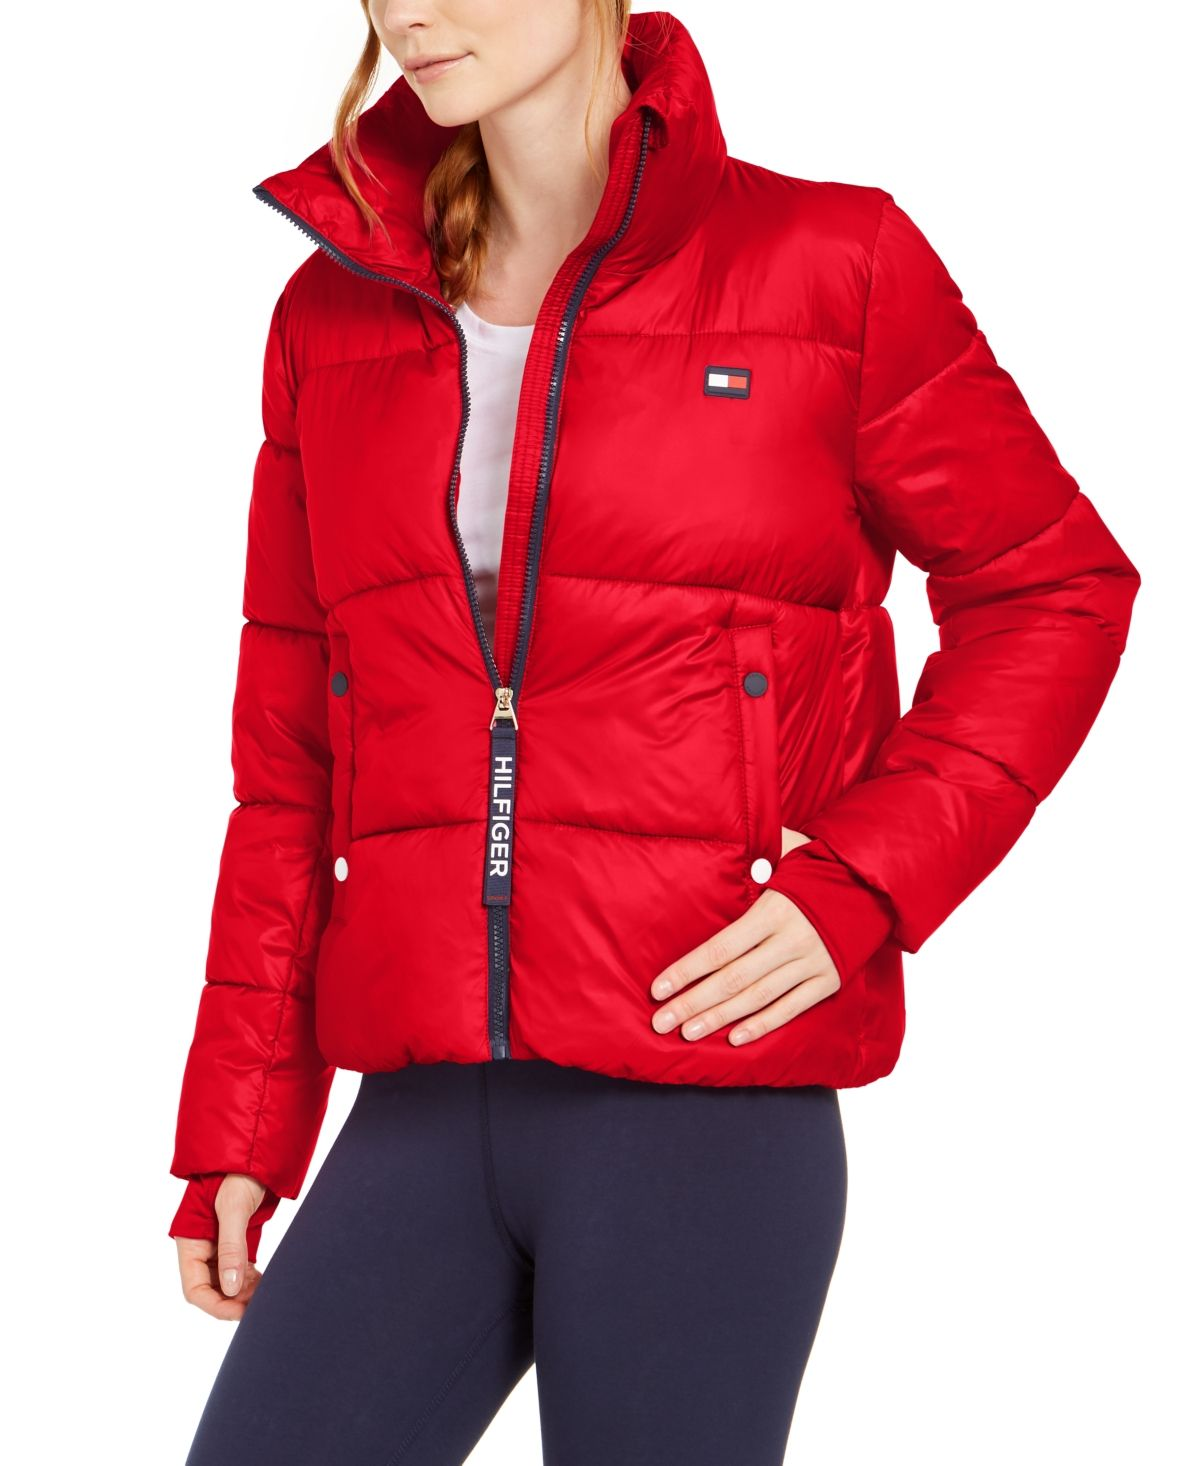 Tommy Hilfiger Sport Cropped Puffer Jacket Pantalones Rojos Ropa Pantalones [ 1466 x 1200 Pixel ]